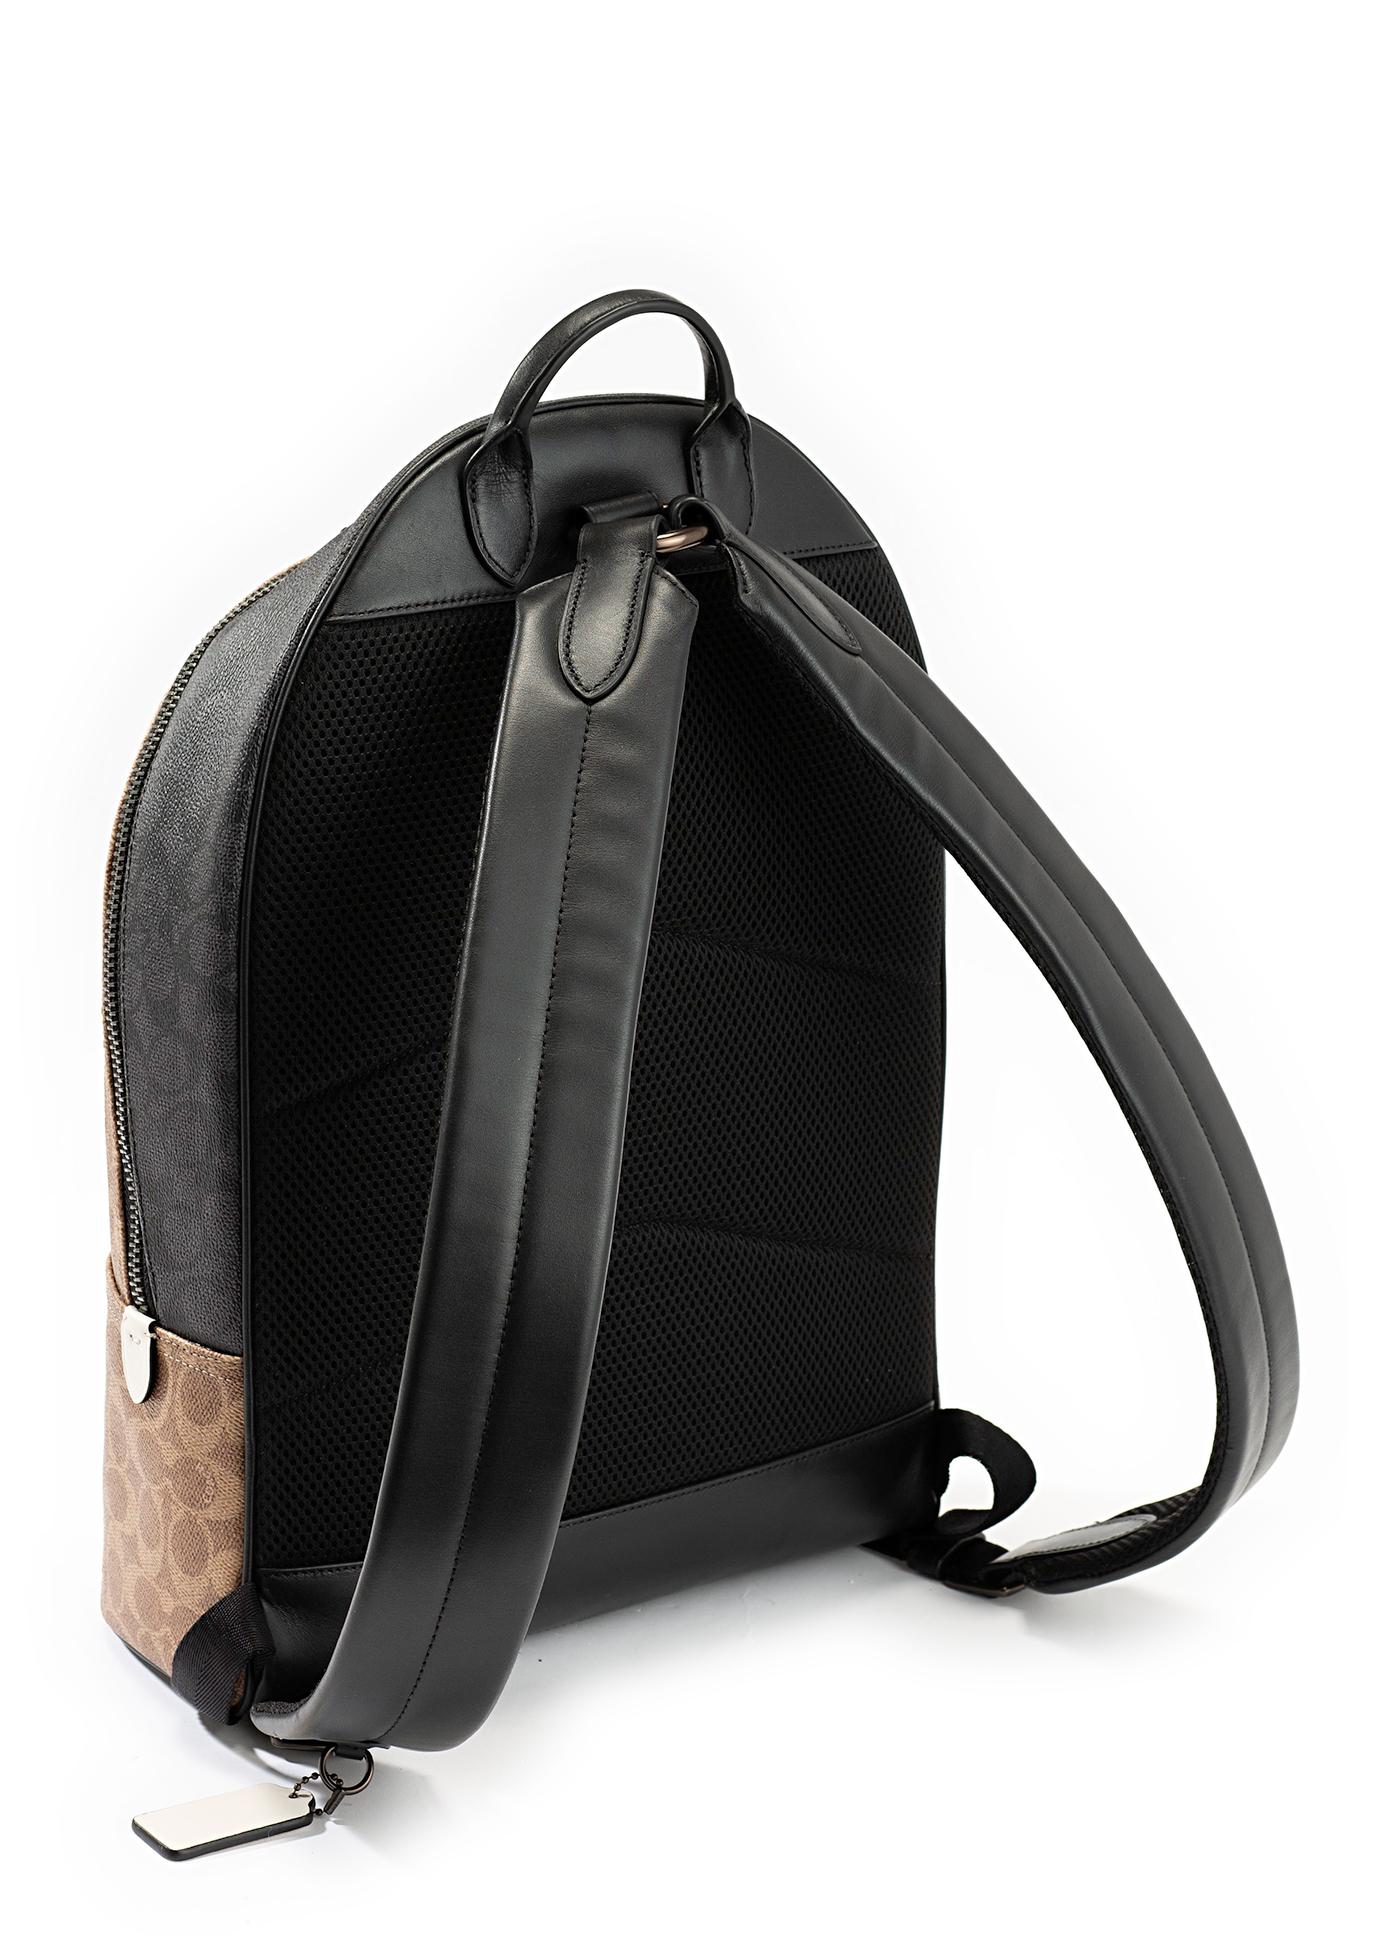 METRO Backpack image number 1